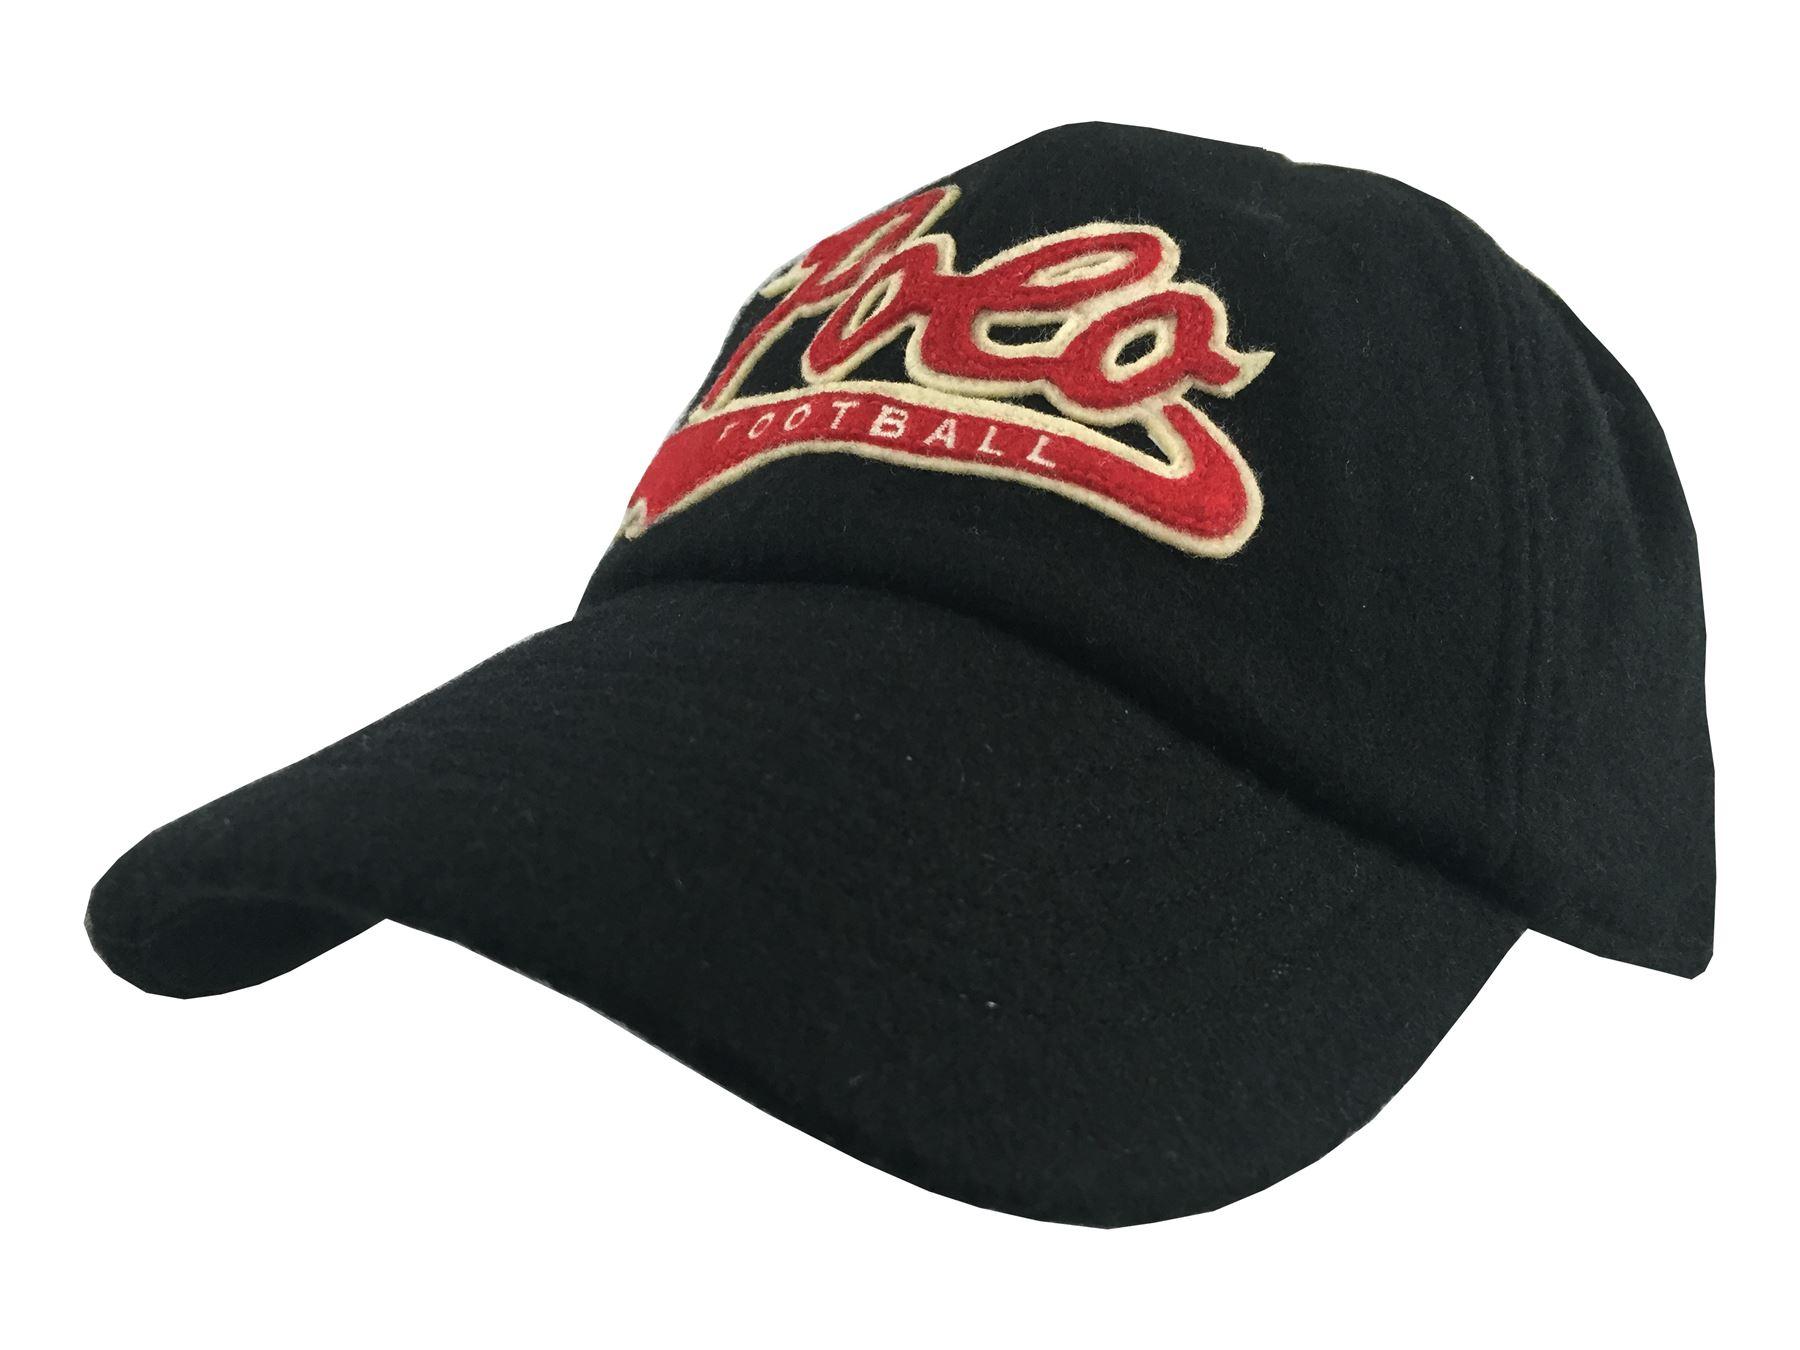 new ralph lauren polo black red cream football adult fitted baseball cap ebay. Black Bedroom Furniture Sets. Home Design Ideas